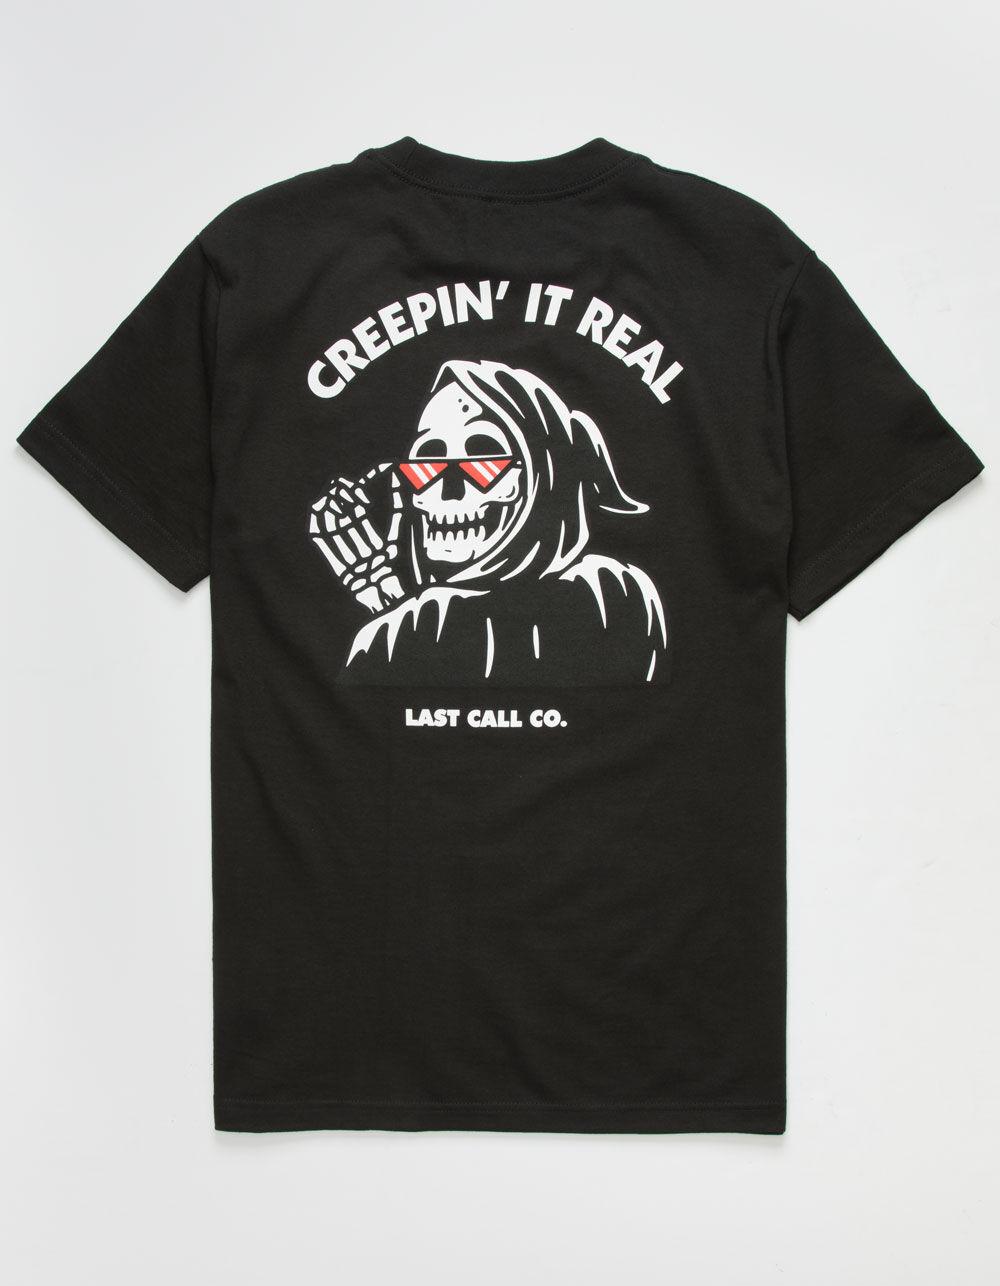 Image of LAST CALL CO. Creepin It Real T-Shirt